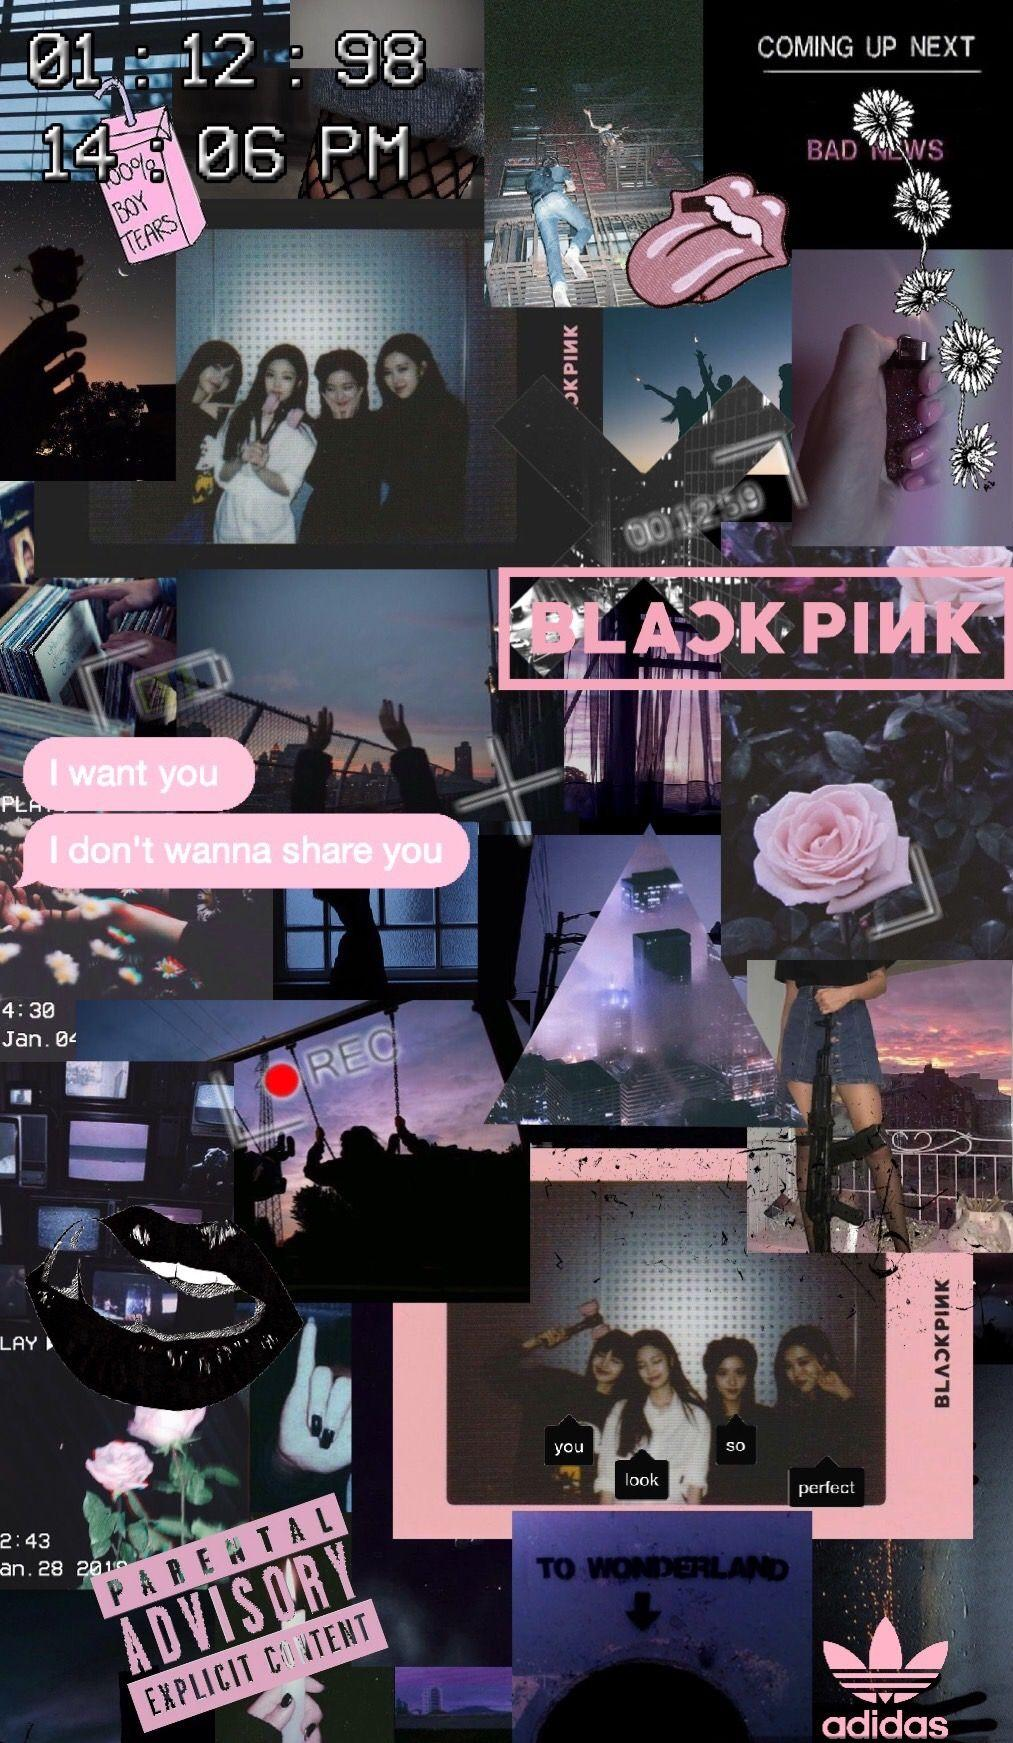 blackpink aesthetic phone wallpapers